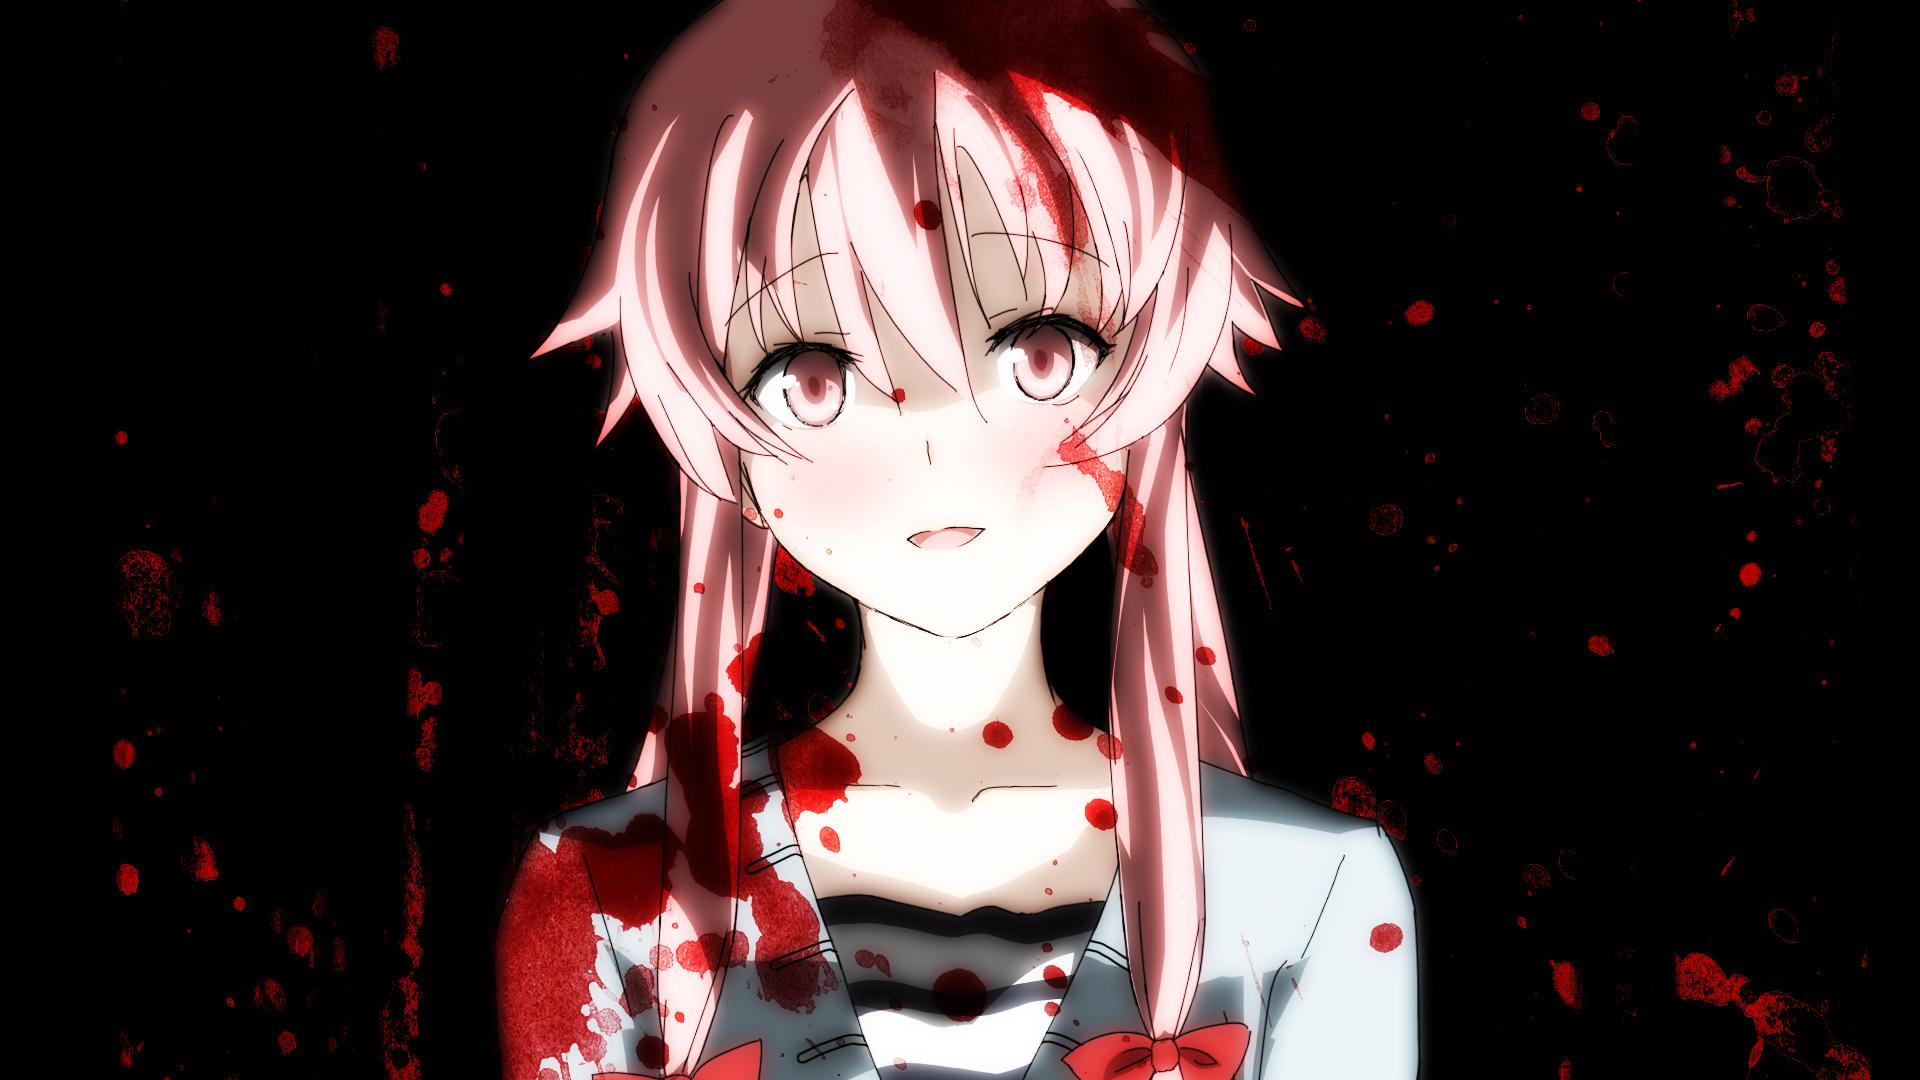 Gasai Yuno Mirai Nikki Zerochan Anime Image Board